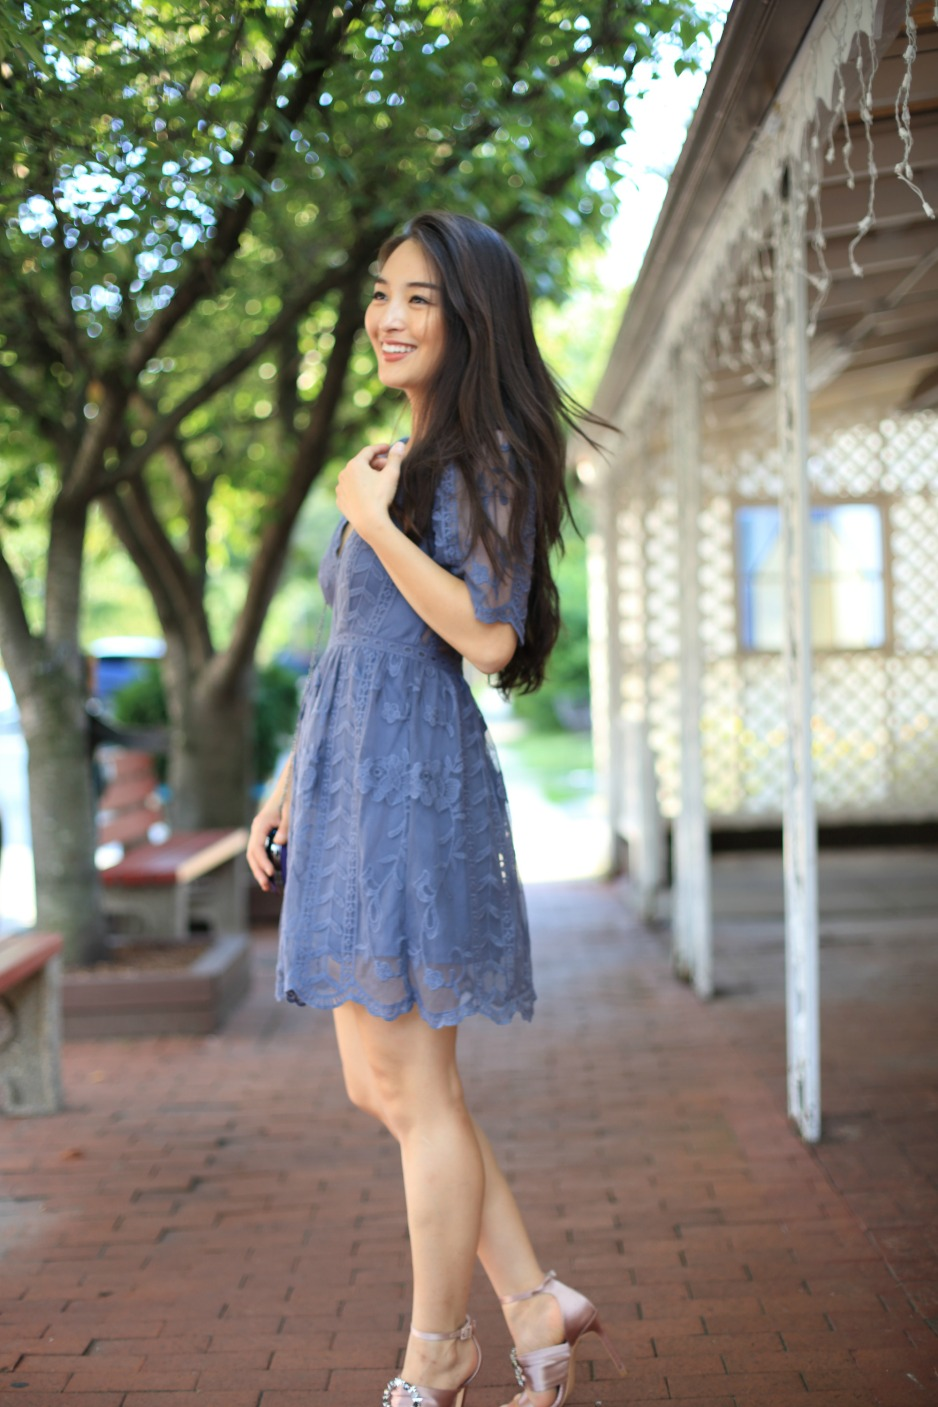 socialite blue dress